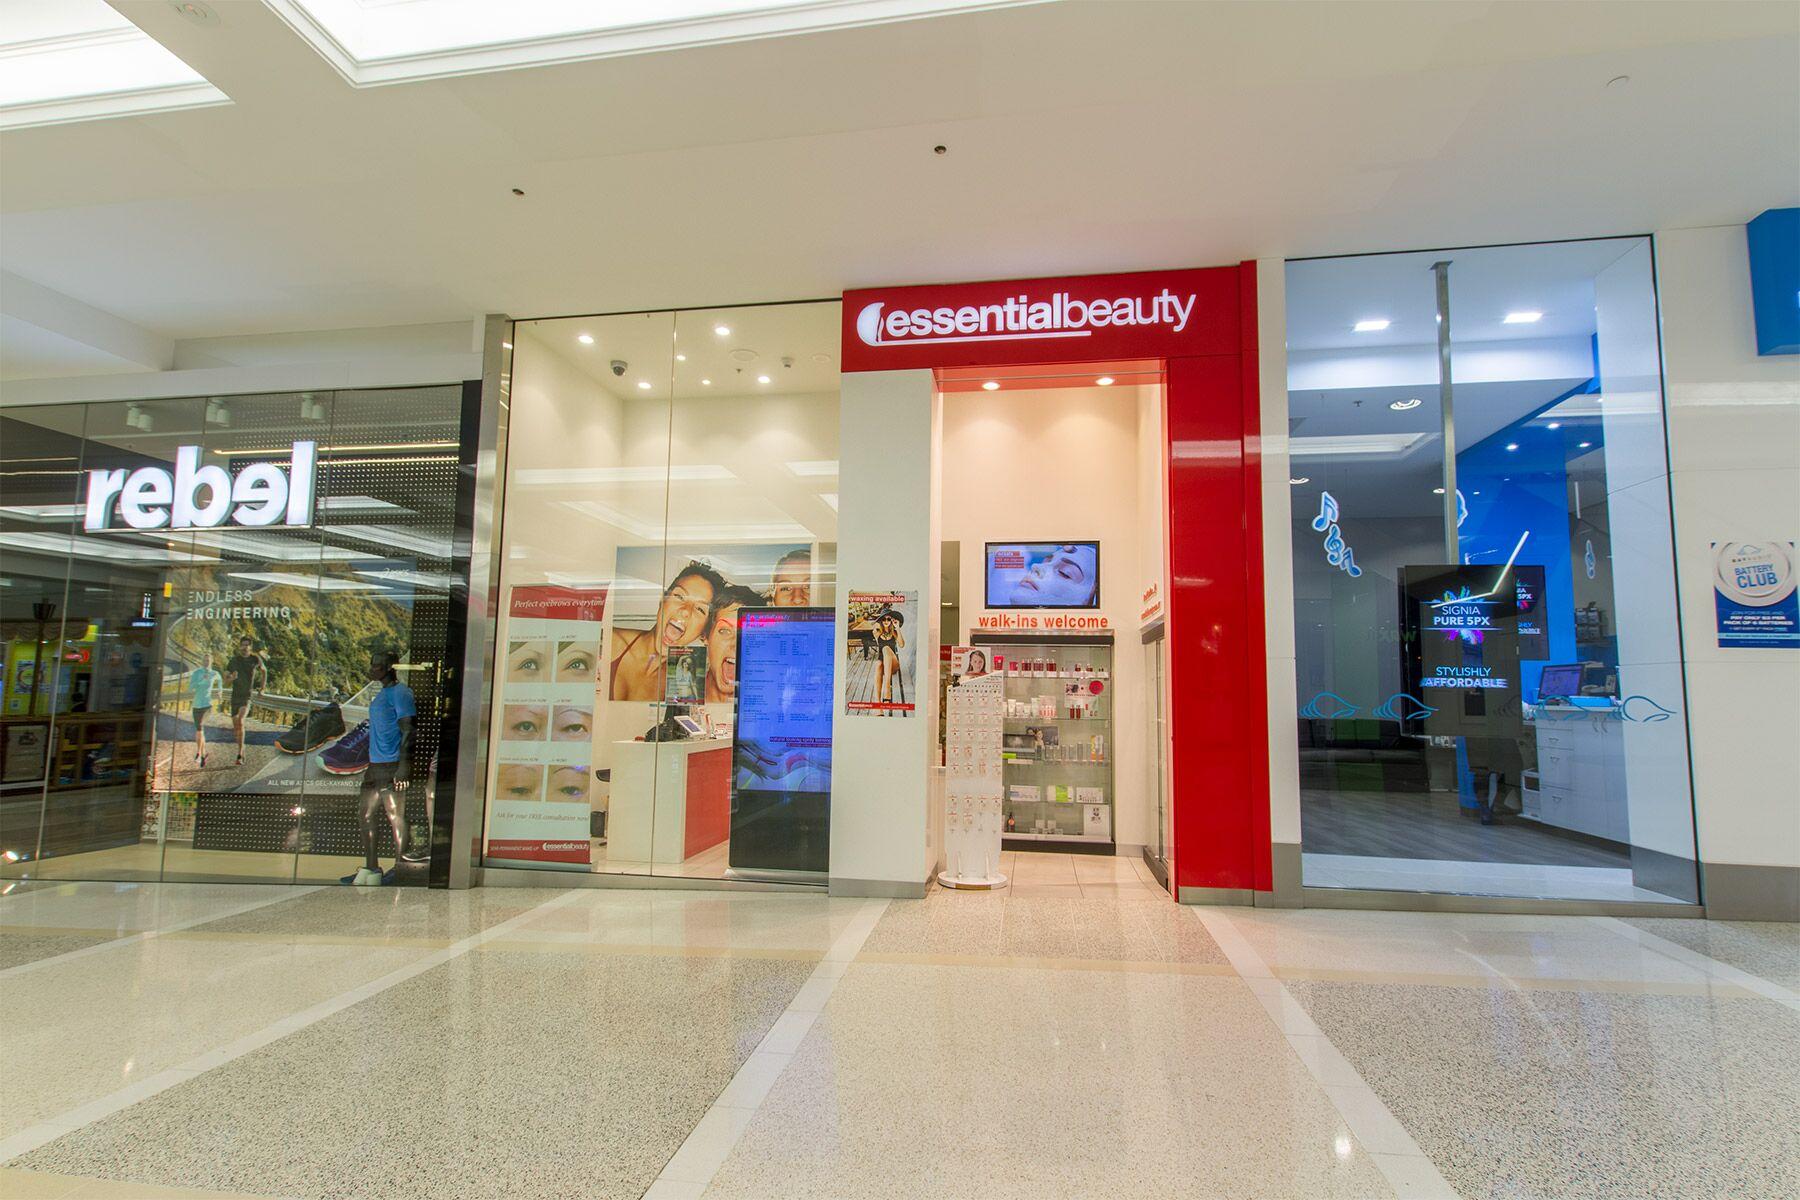 australia-fair-shopping-centre-essential-beauty-franchise-opportunity-6